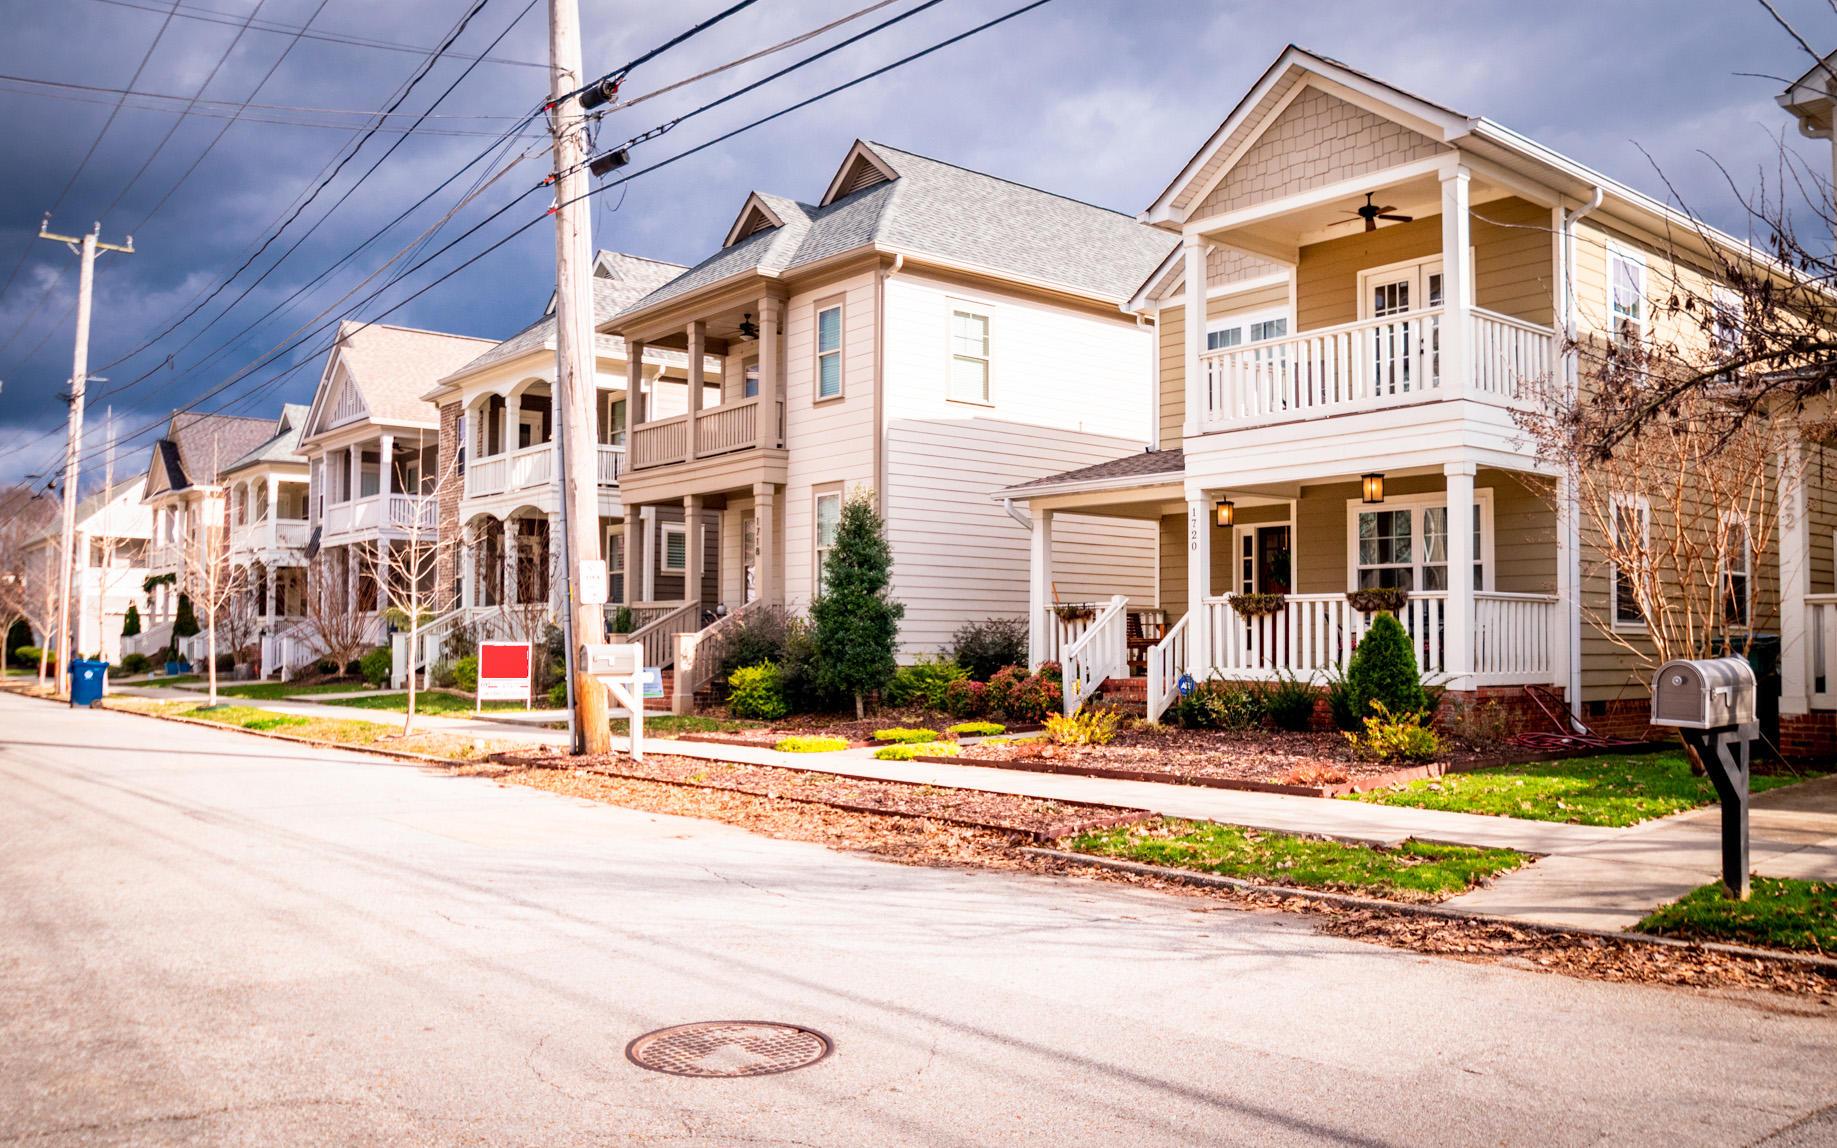 1720 Long St, Chattanooga, TN 37408